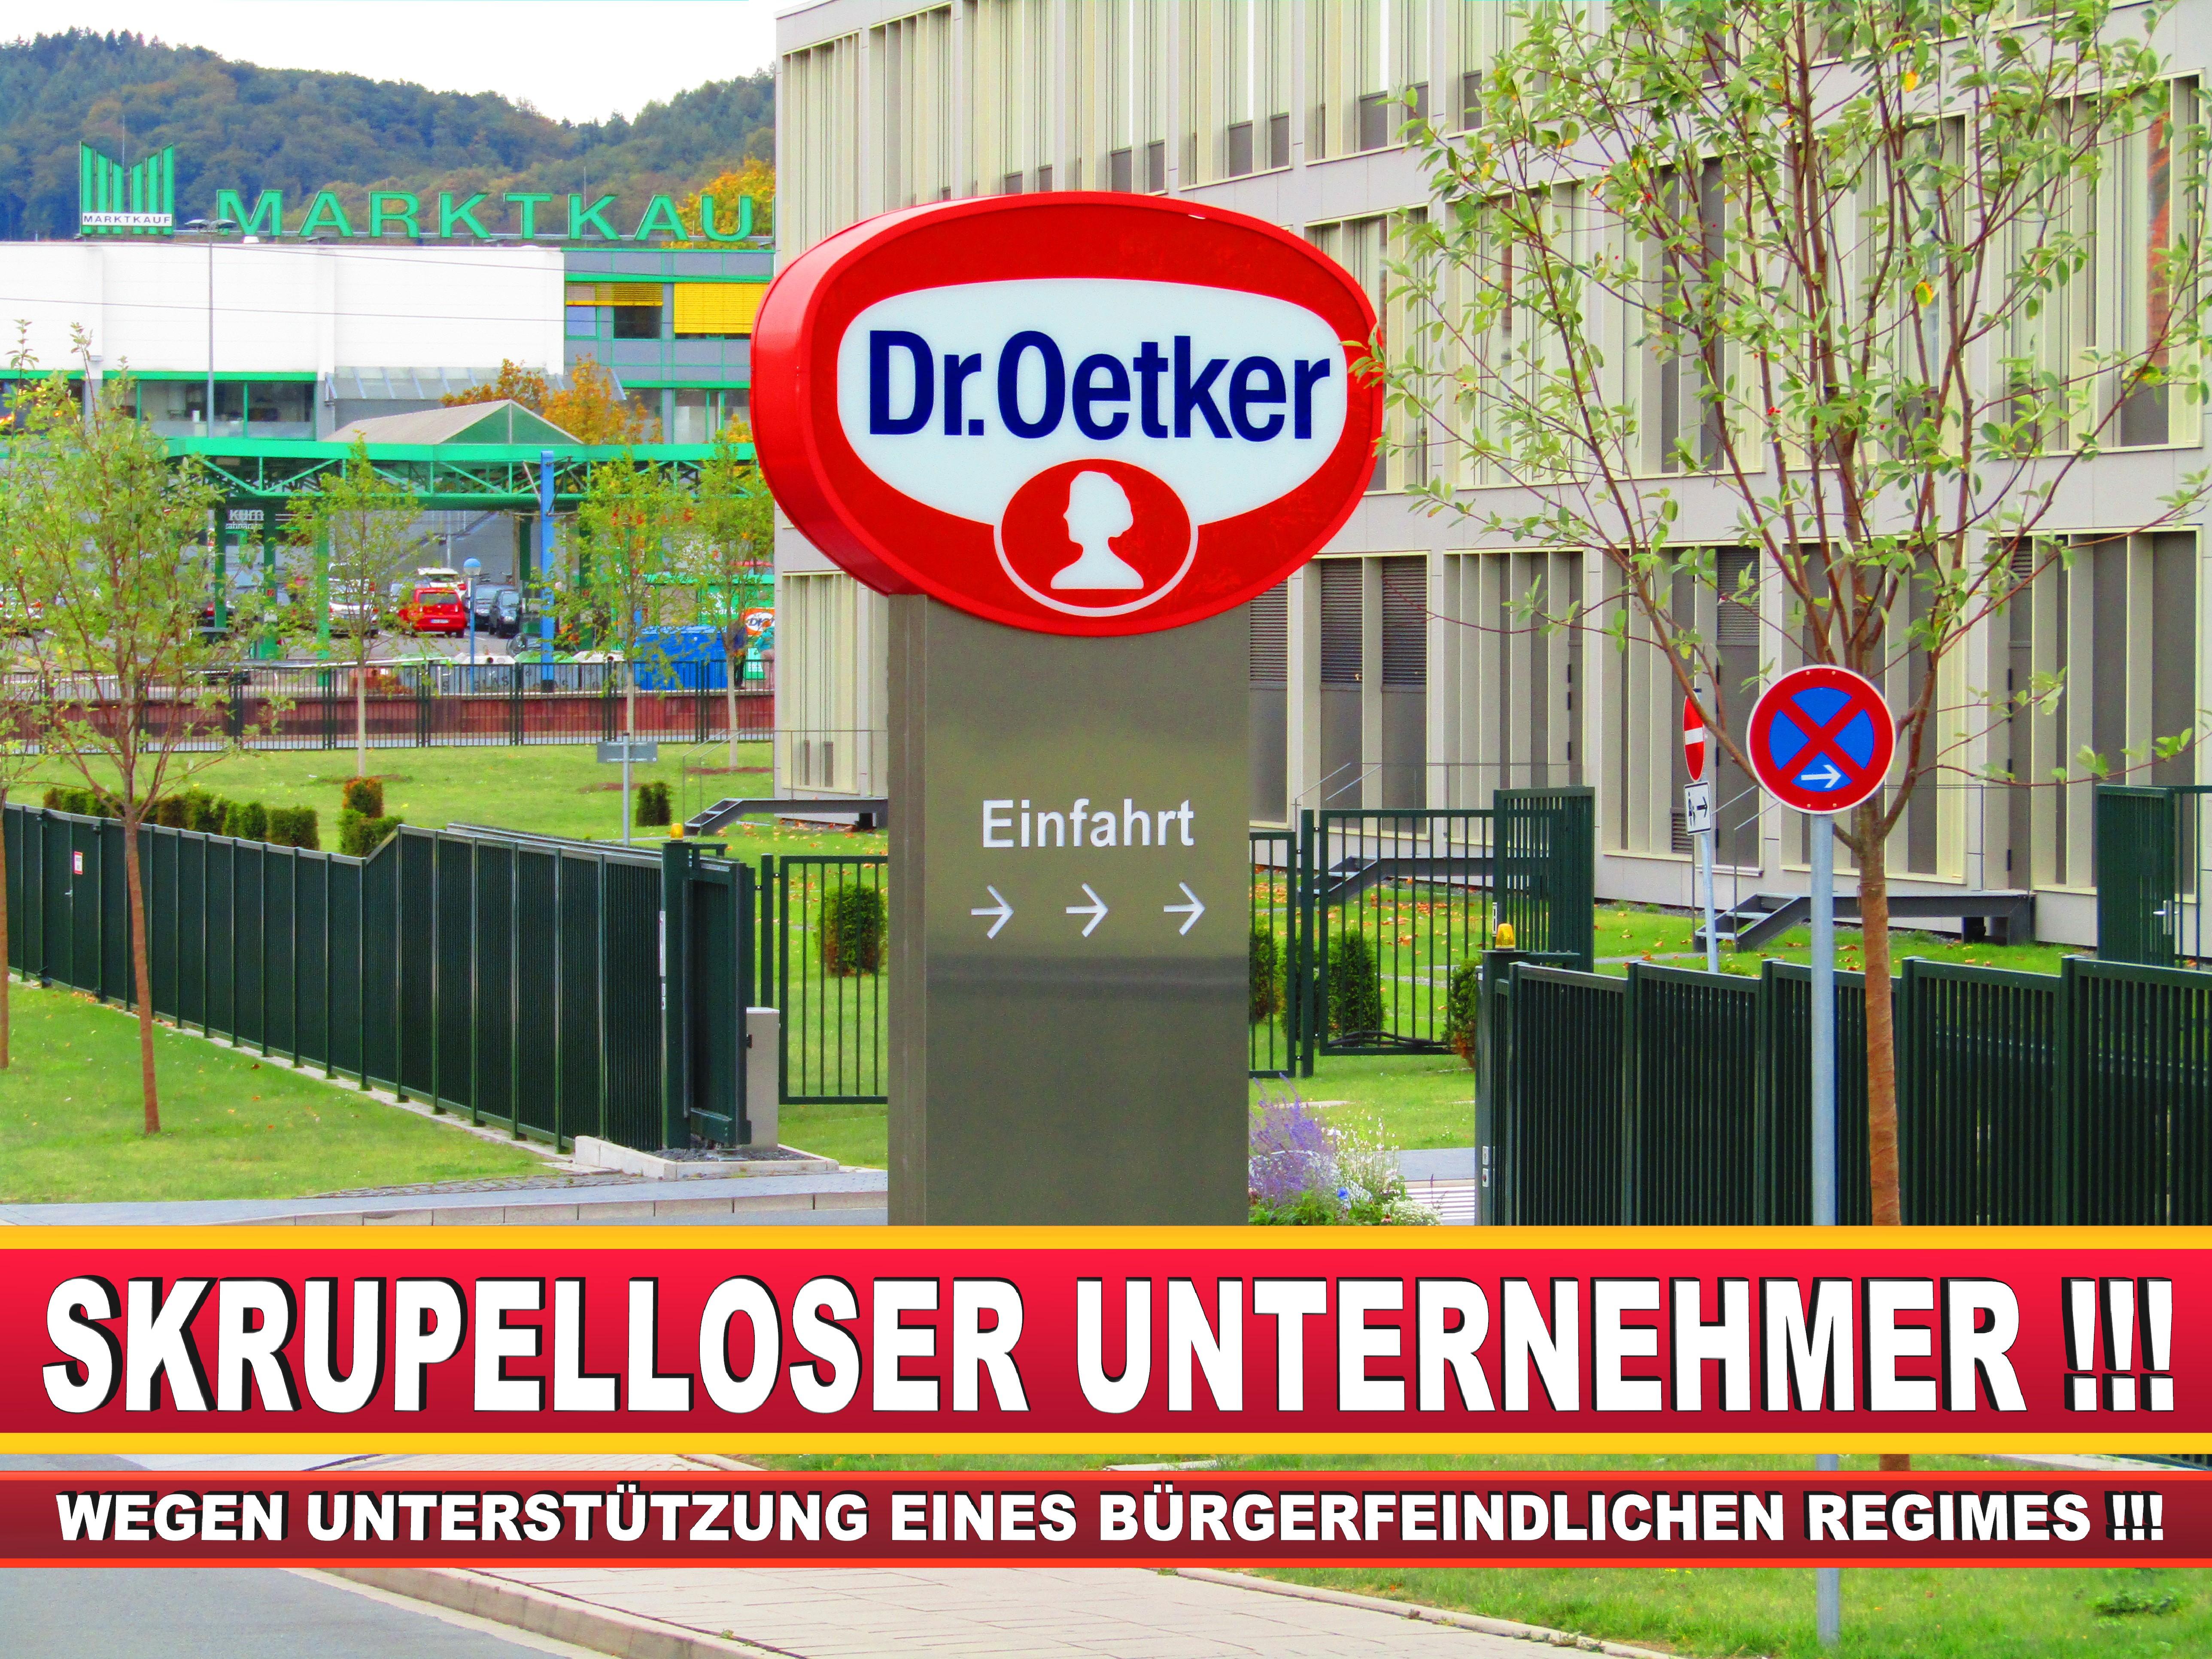 Dr Oetker Bielefeld CDU Bielefeld Spendengelder Skandal Richard August (28)